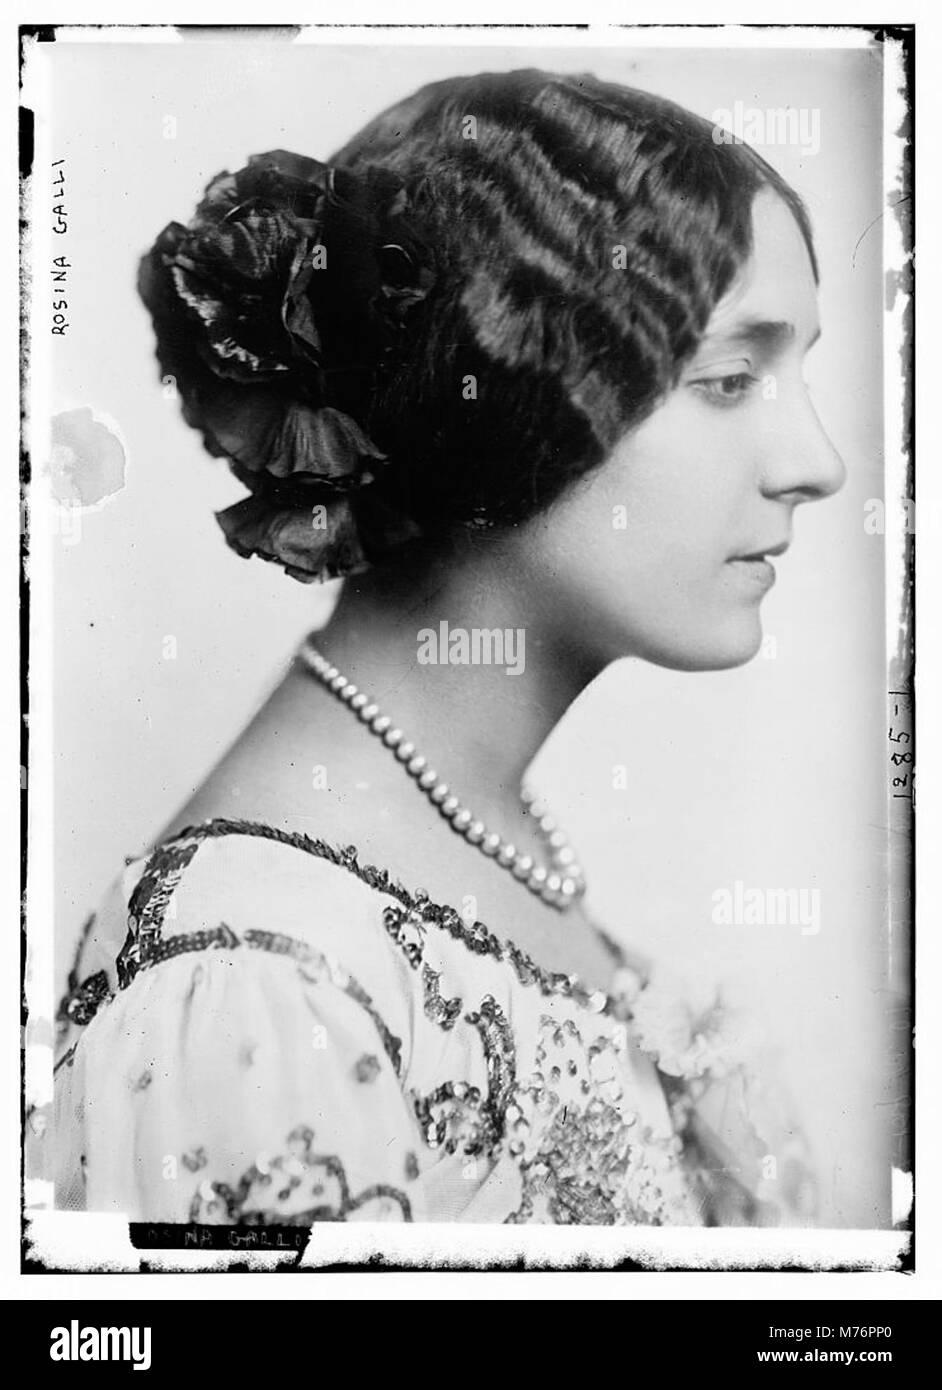 Communication on this topic: Arlene Banas, rosina-galli-actress/